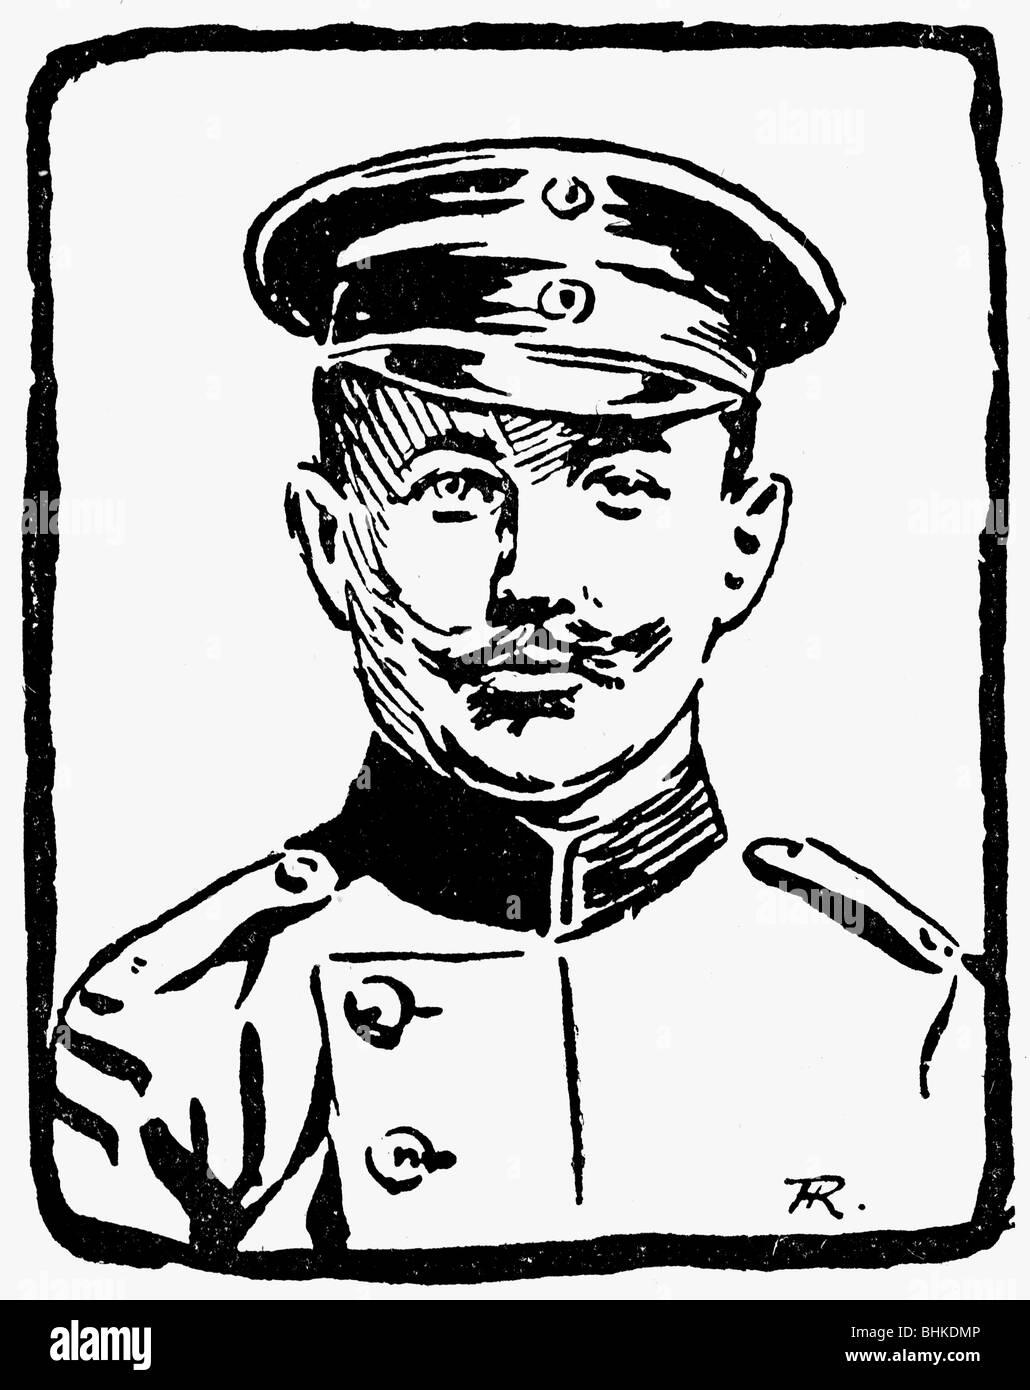 geography / travel, China, Boxer Rebellion 1900/1901, European Intervention, Germ,an Lieutenant Max Drewello, 1st - Stock Image